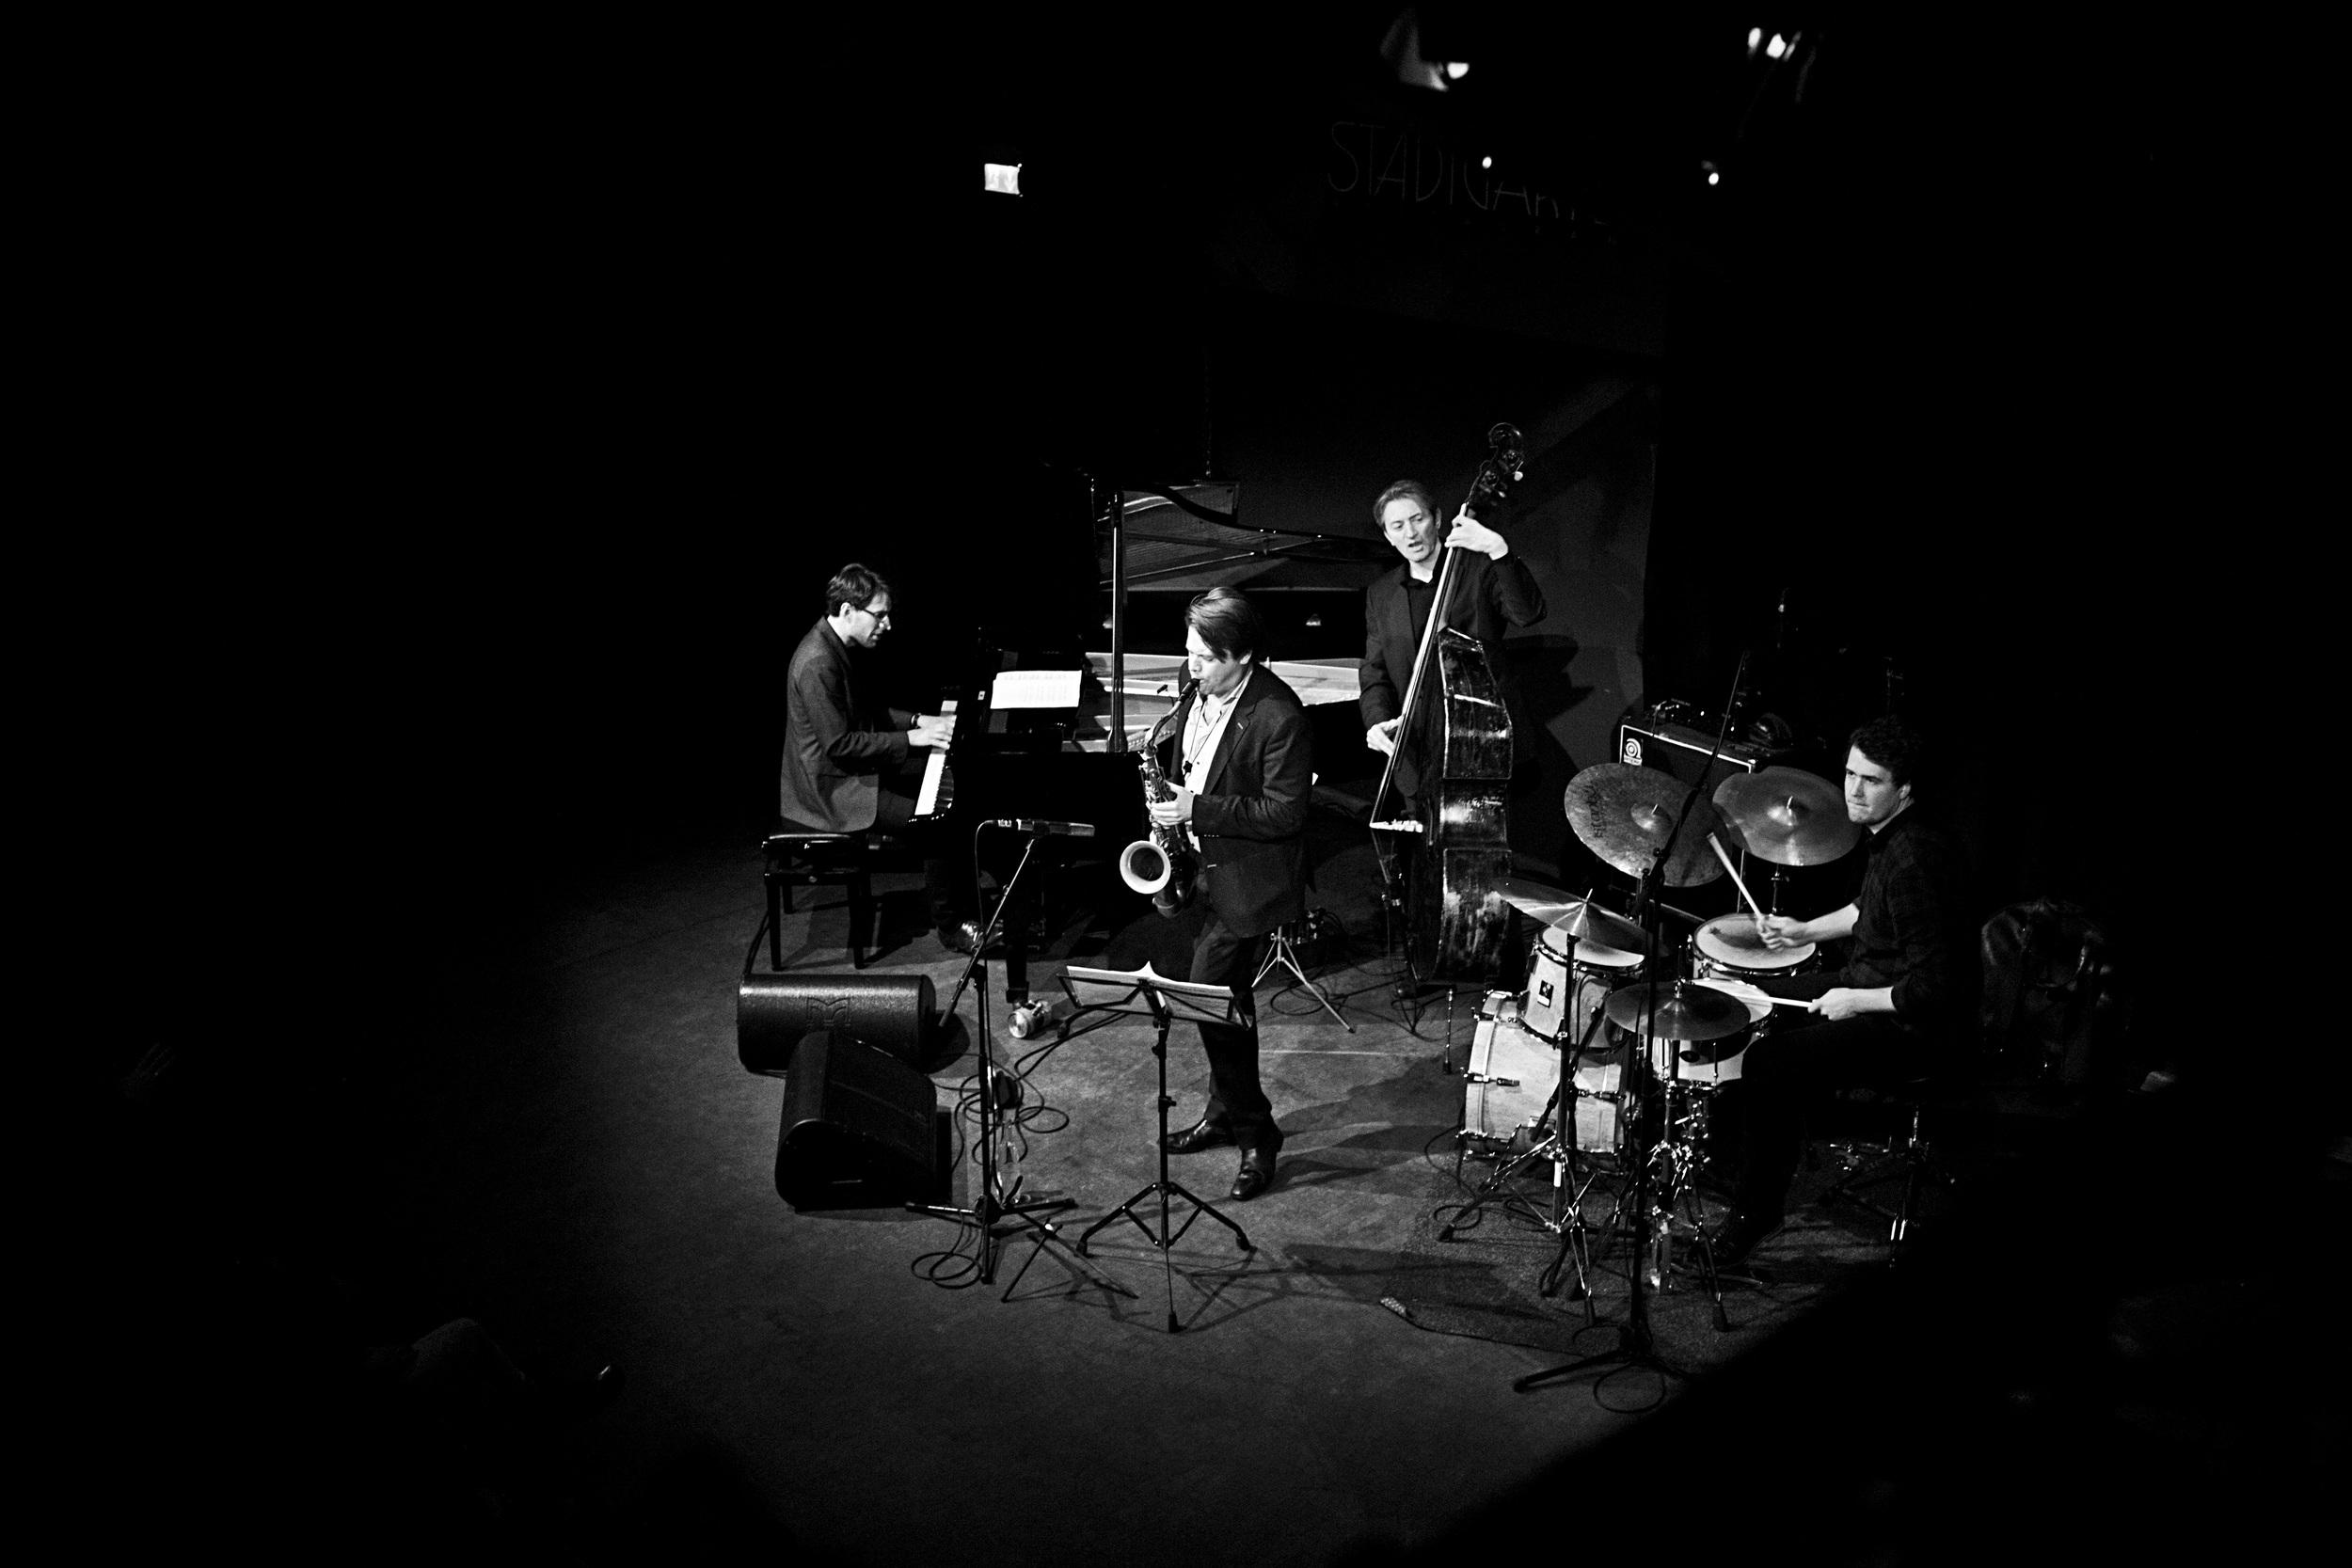 fabian stuertz 2016.02.28 - denis gäbel quartet - stadtgarten 0010-bw.jpg